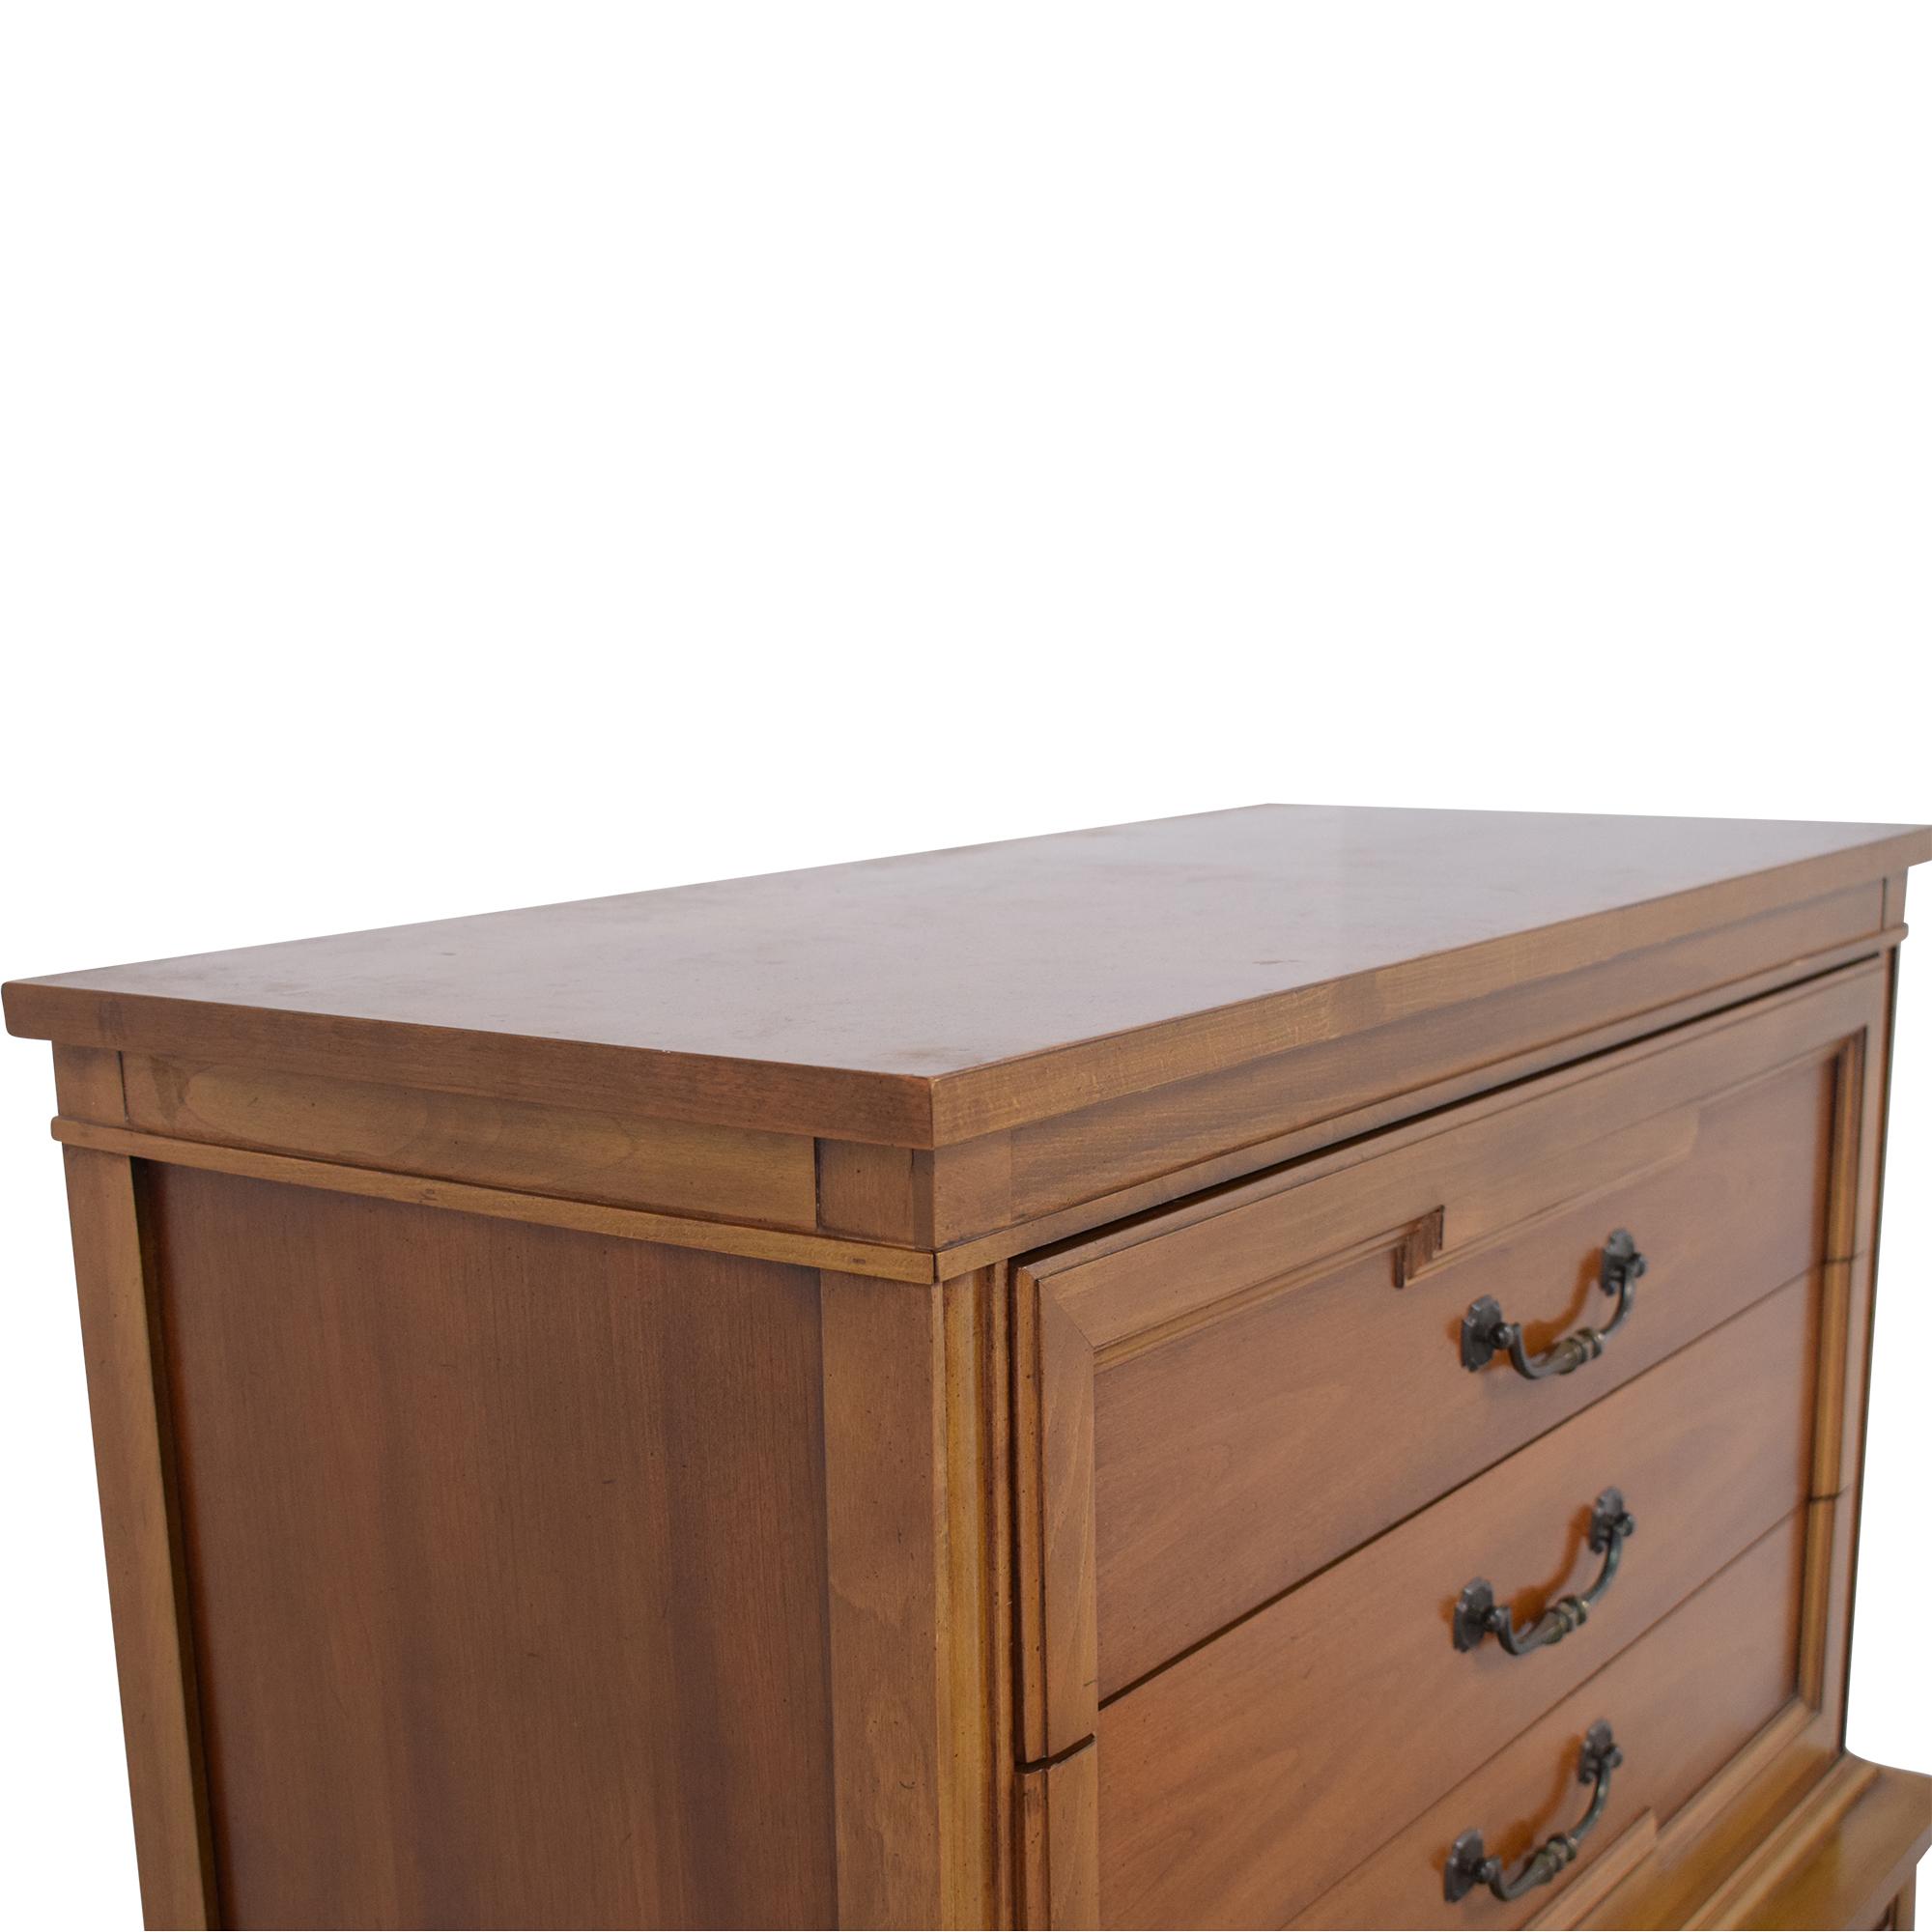 Thomasville Thomasville Six Drawer Chest of Drawers Dresser discount